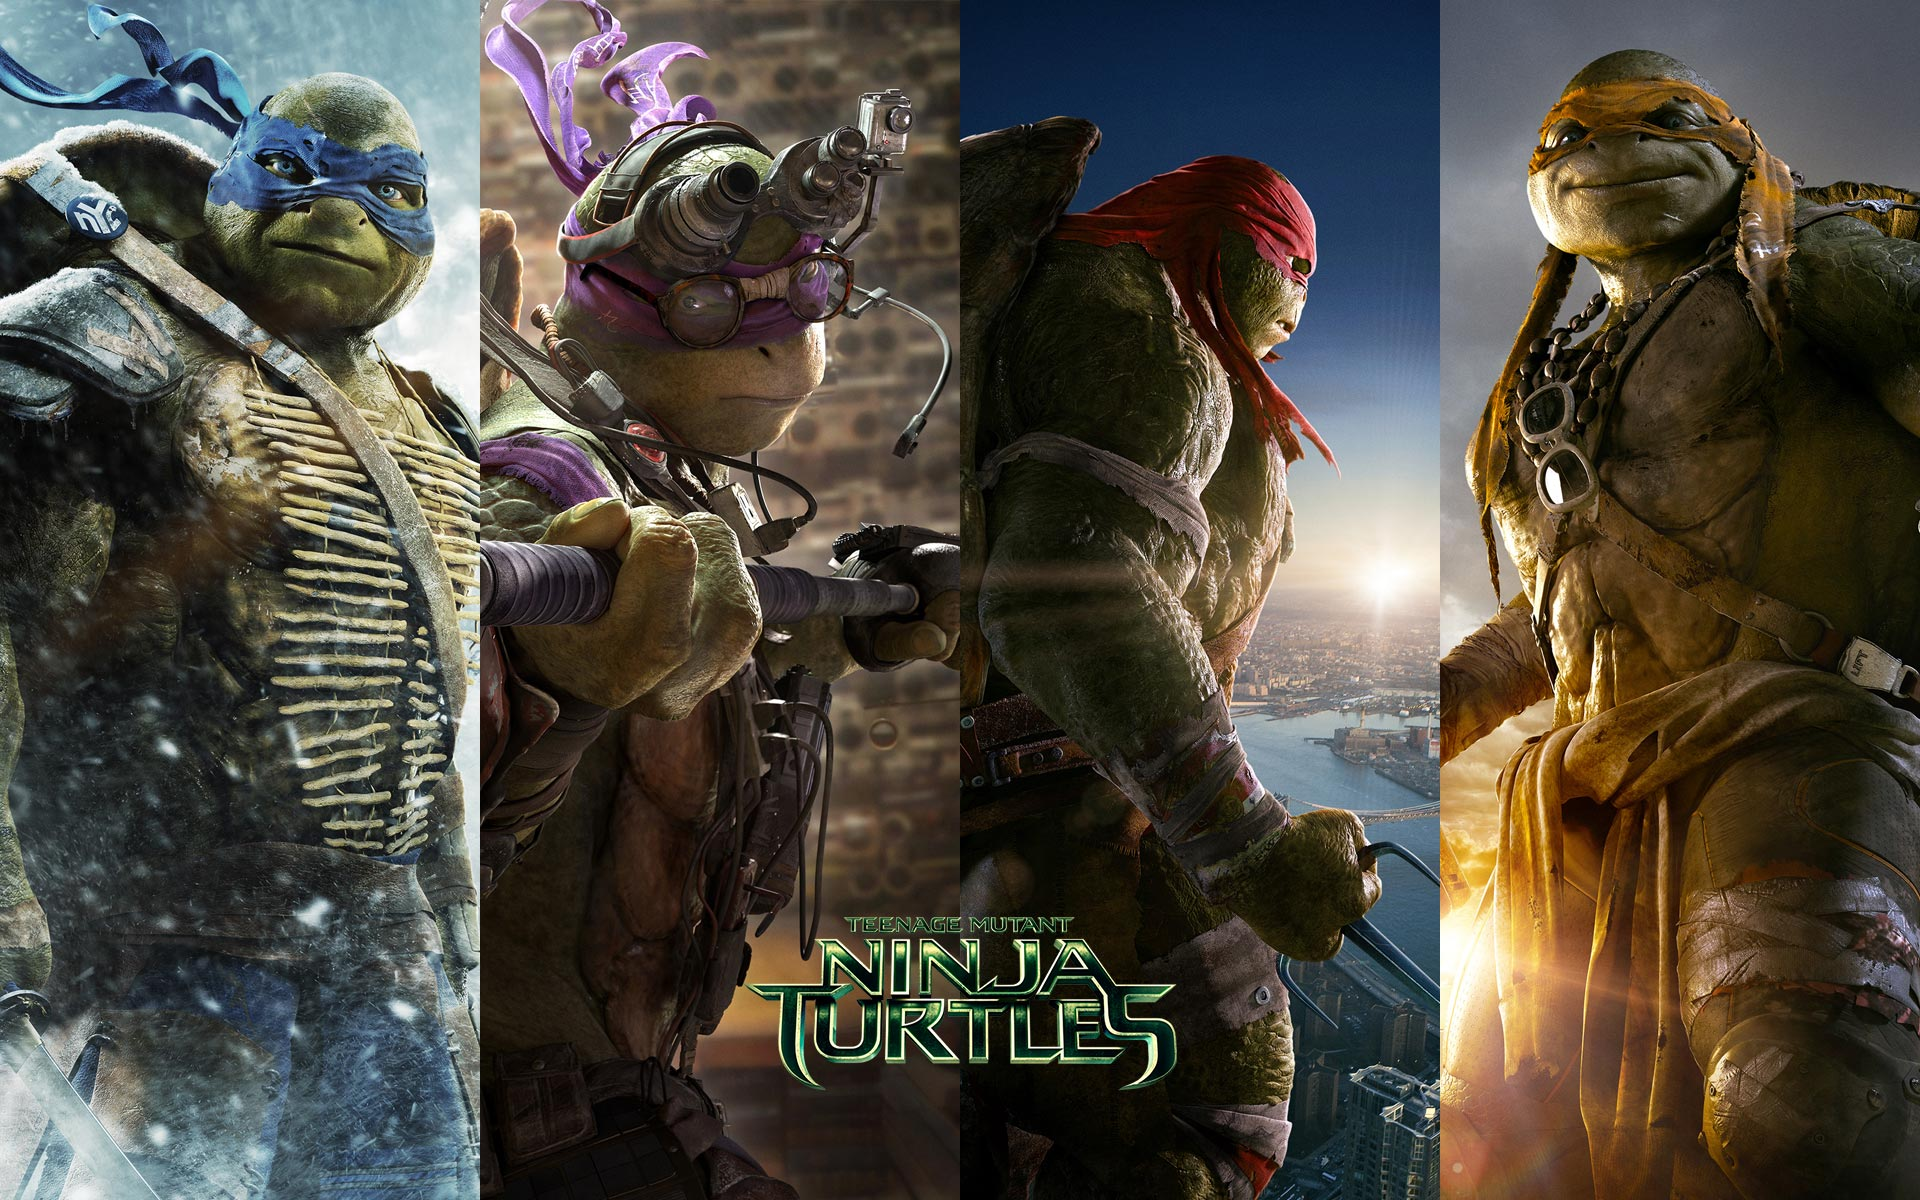 Review Teenage Mutant Ninja Turtles